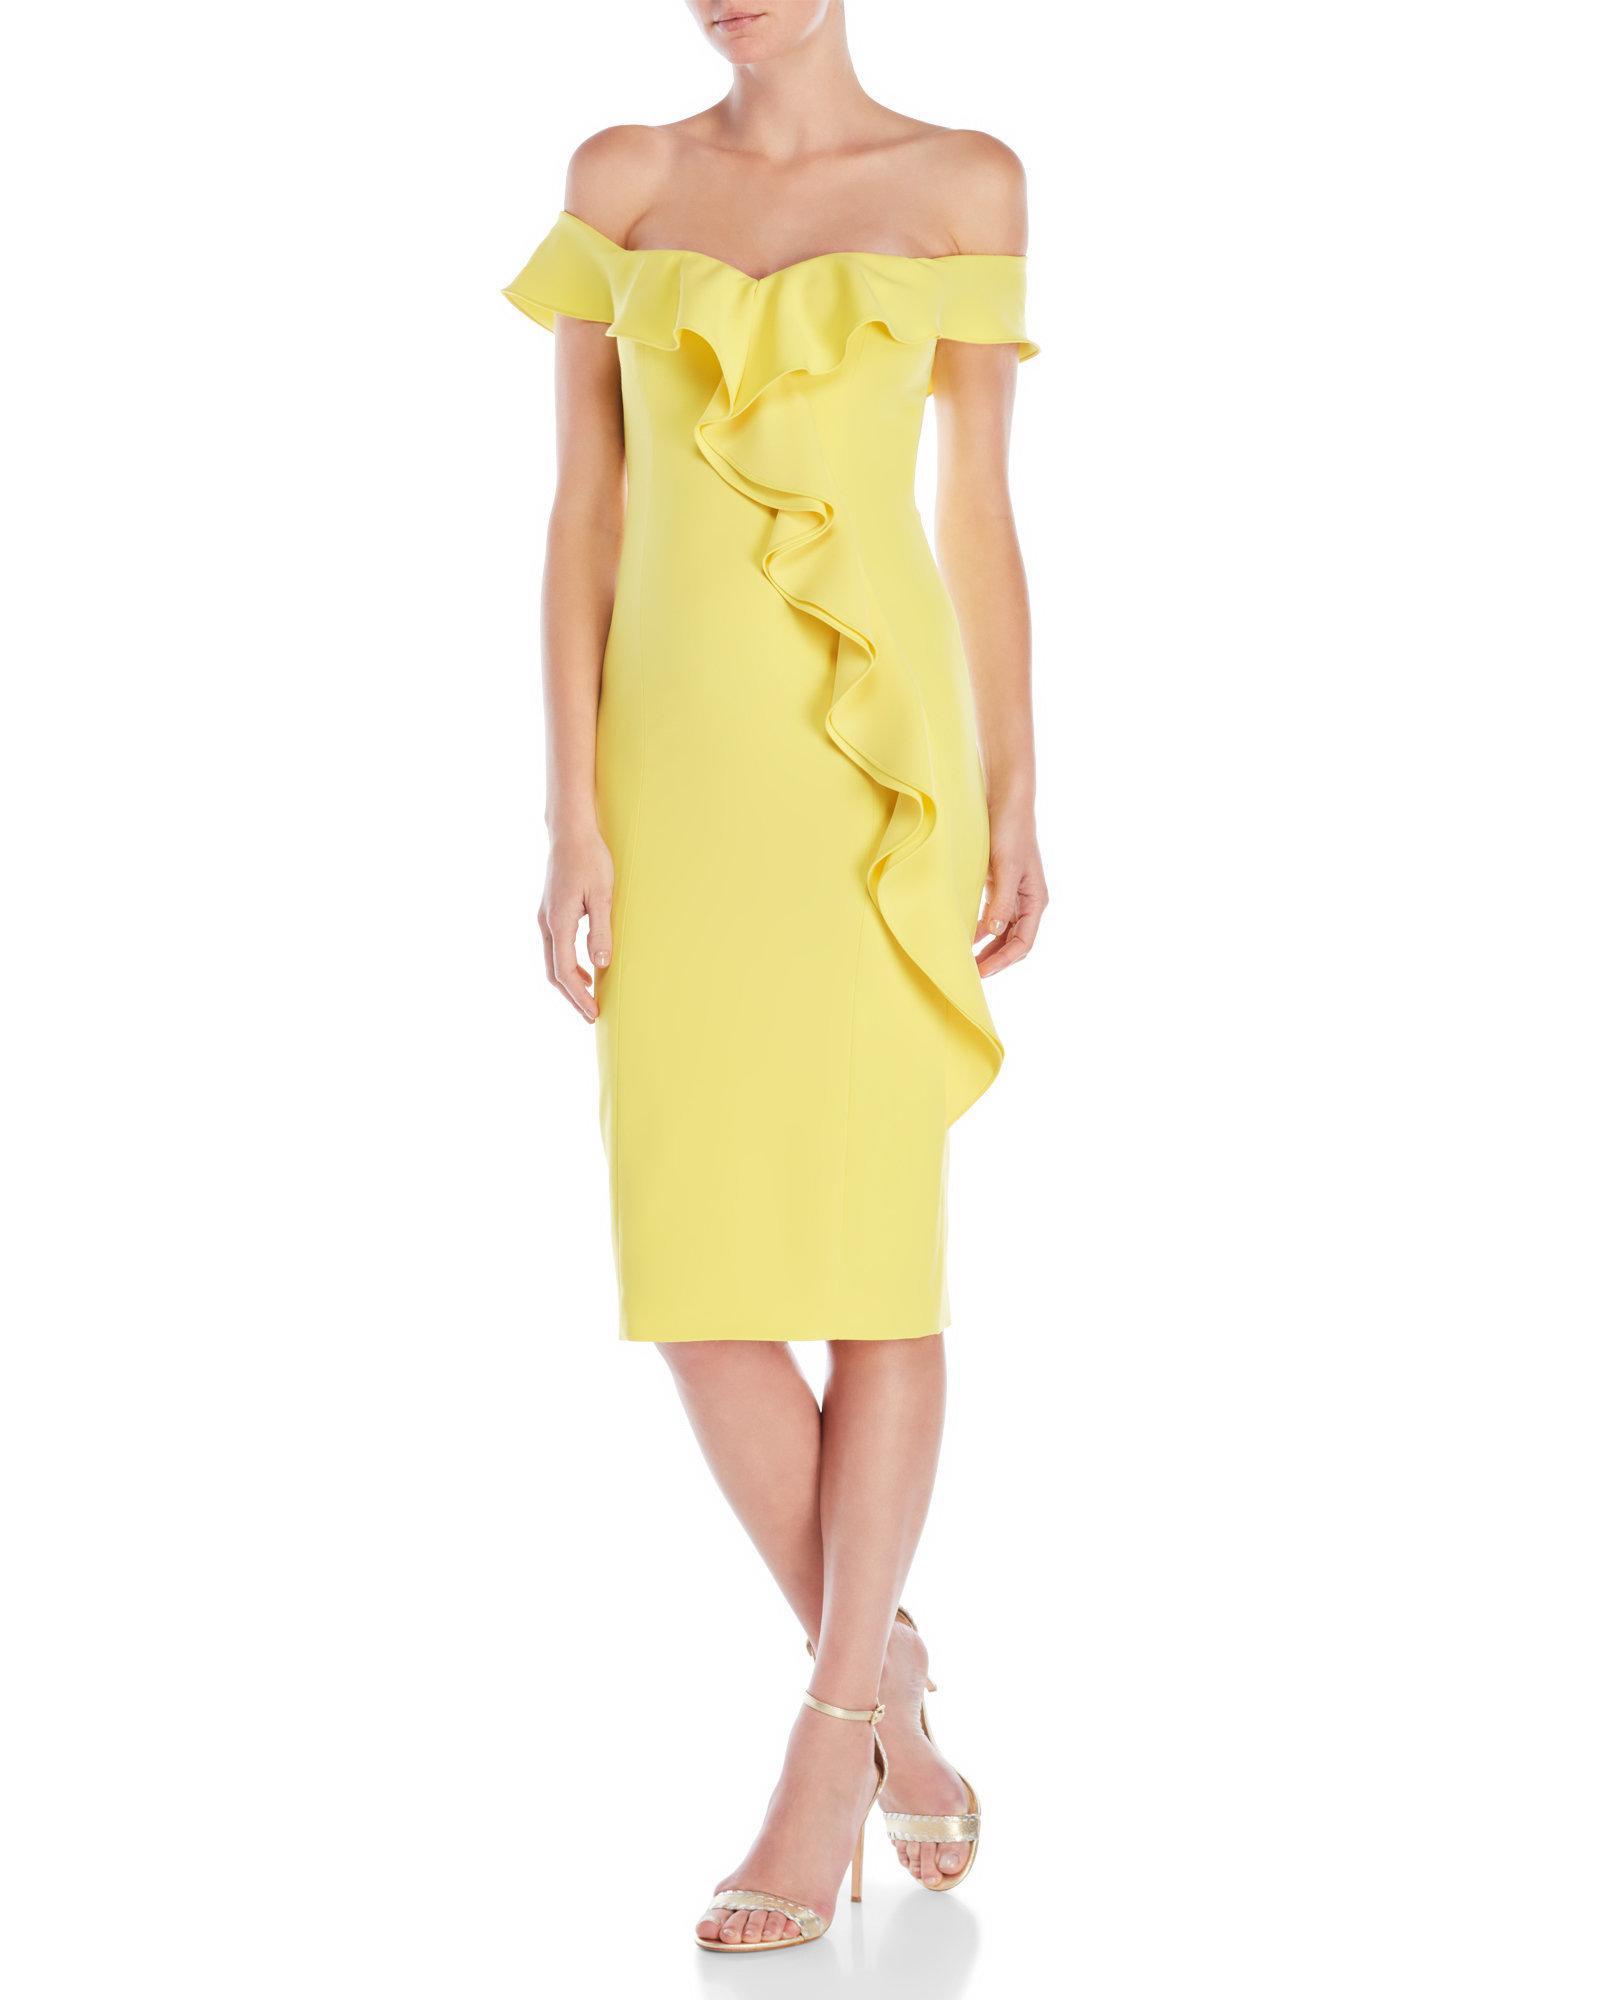 Lyst - Jay Godfrey Gatlin Off-The-Shoulder Ruffle Dress in Yellow dce6a124c